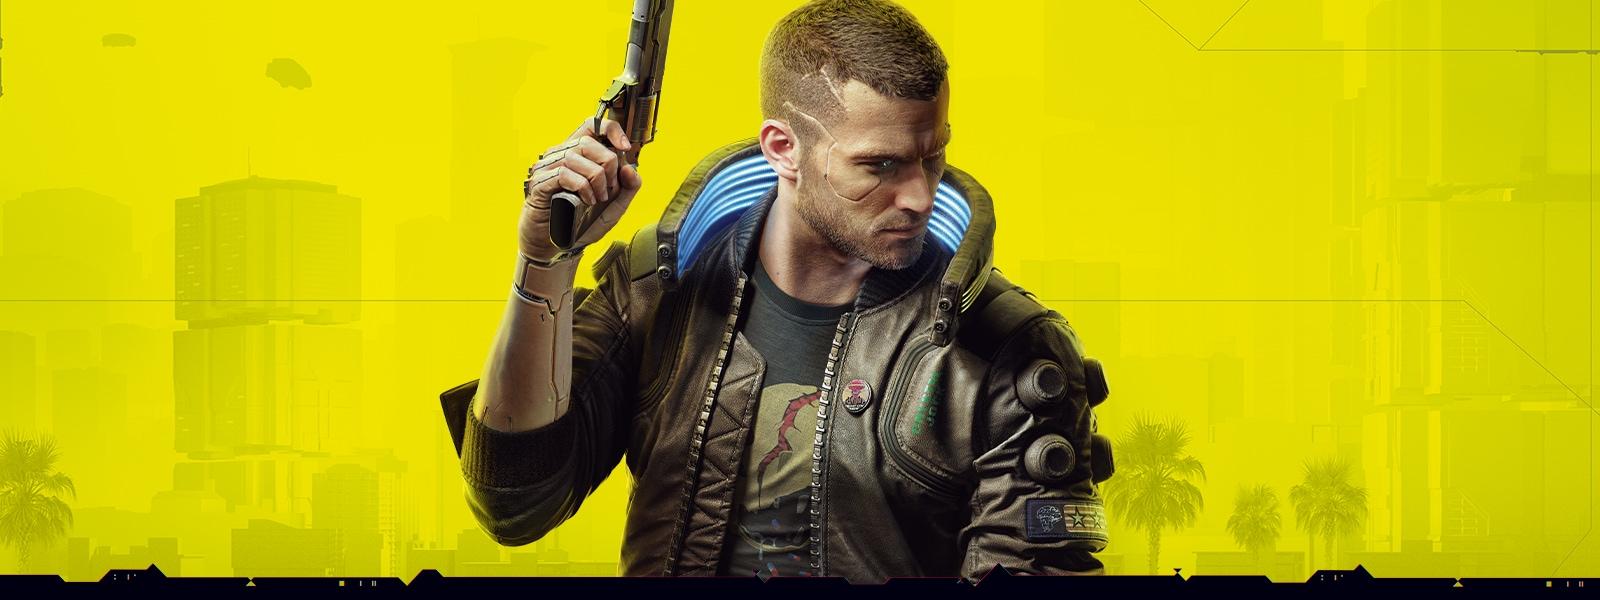 V from cyberpunk 2077 holding up a handgun in the air